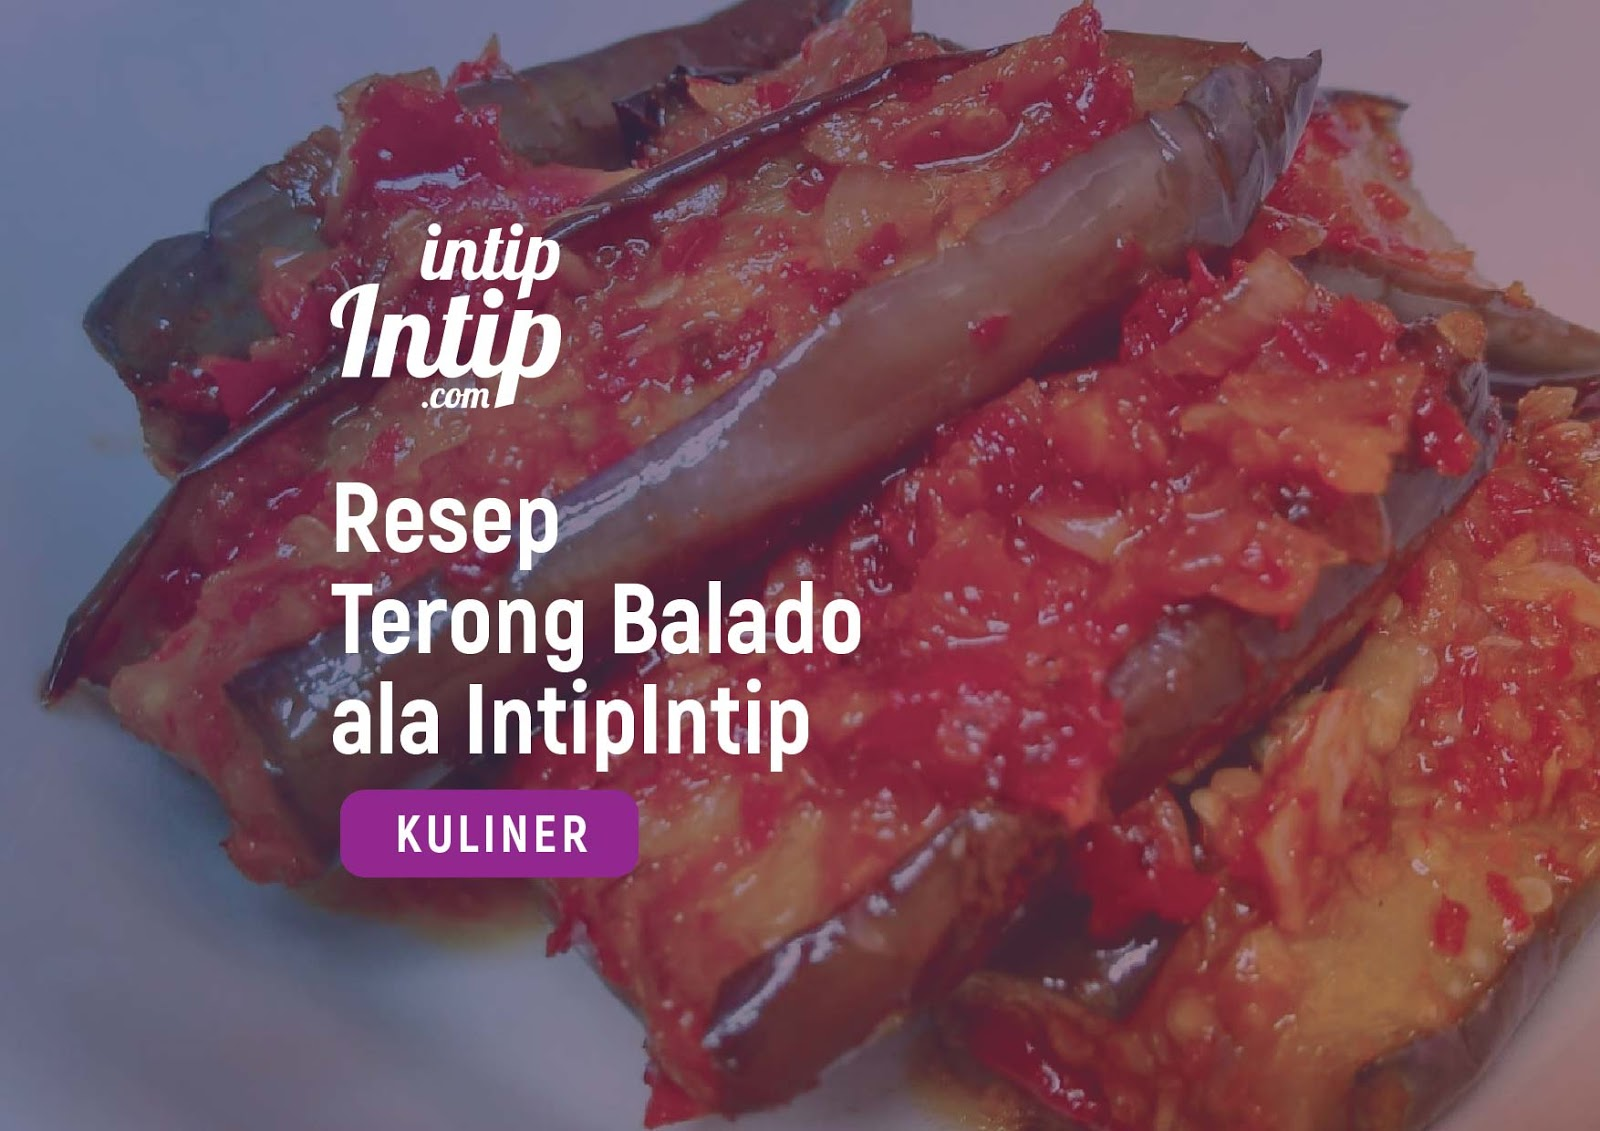 Resep Terong Balado ala IntipIntip